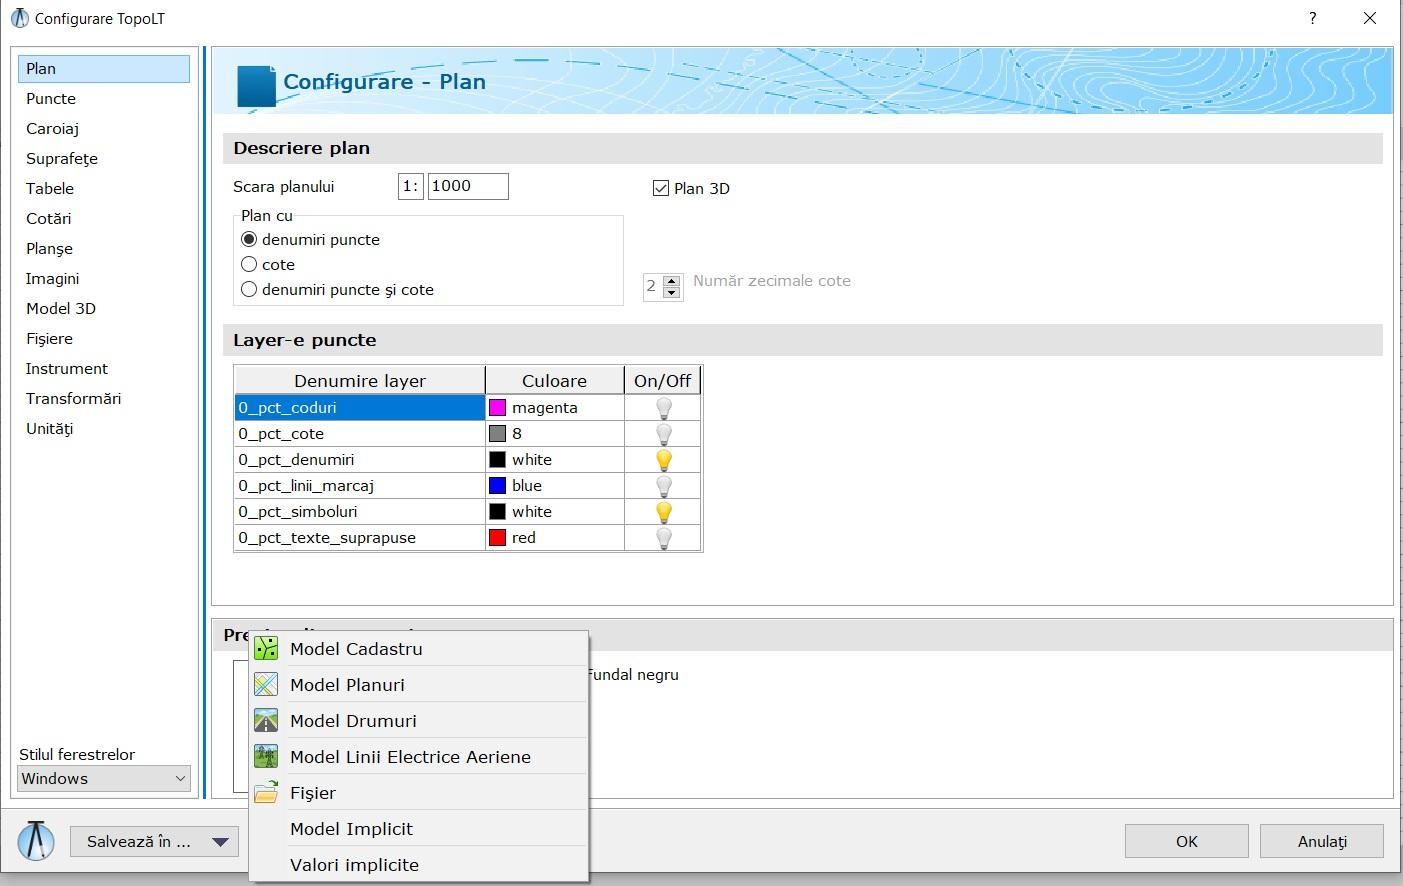 configurare-plan-topolt-cadware-engineering